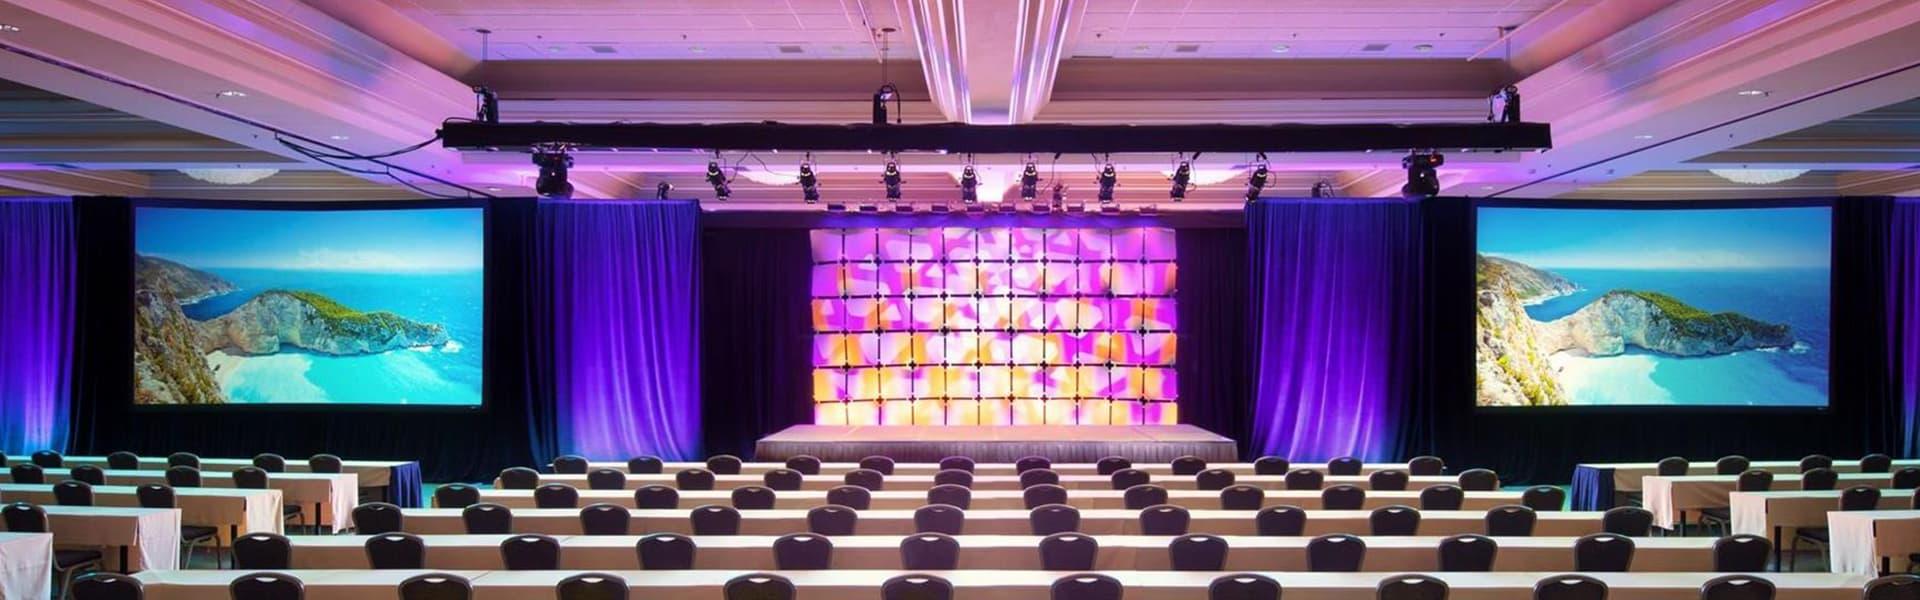 Audio Visual, Speakers, Line Array, Truss, Moving Heads, Martin Mac Aura, Staging, Lighting, JBL Vertec, Conference, Summit, AV, Toronto, Product Launch, AV Production, Audio Visual Production